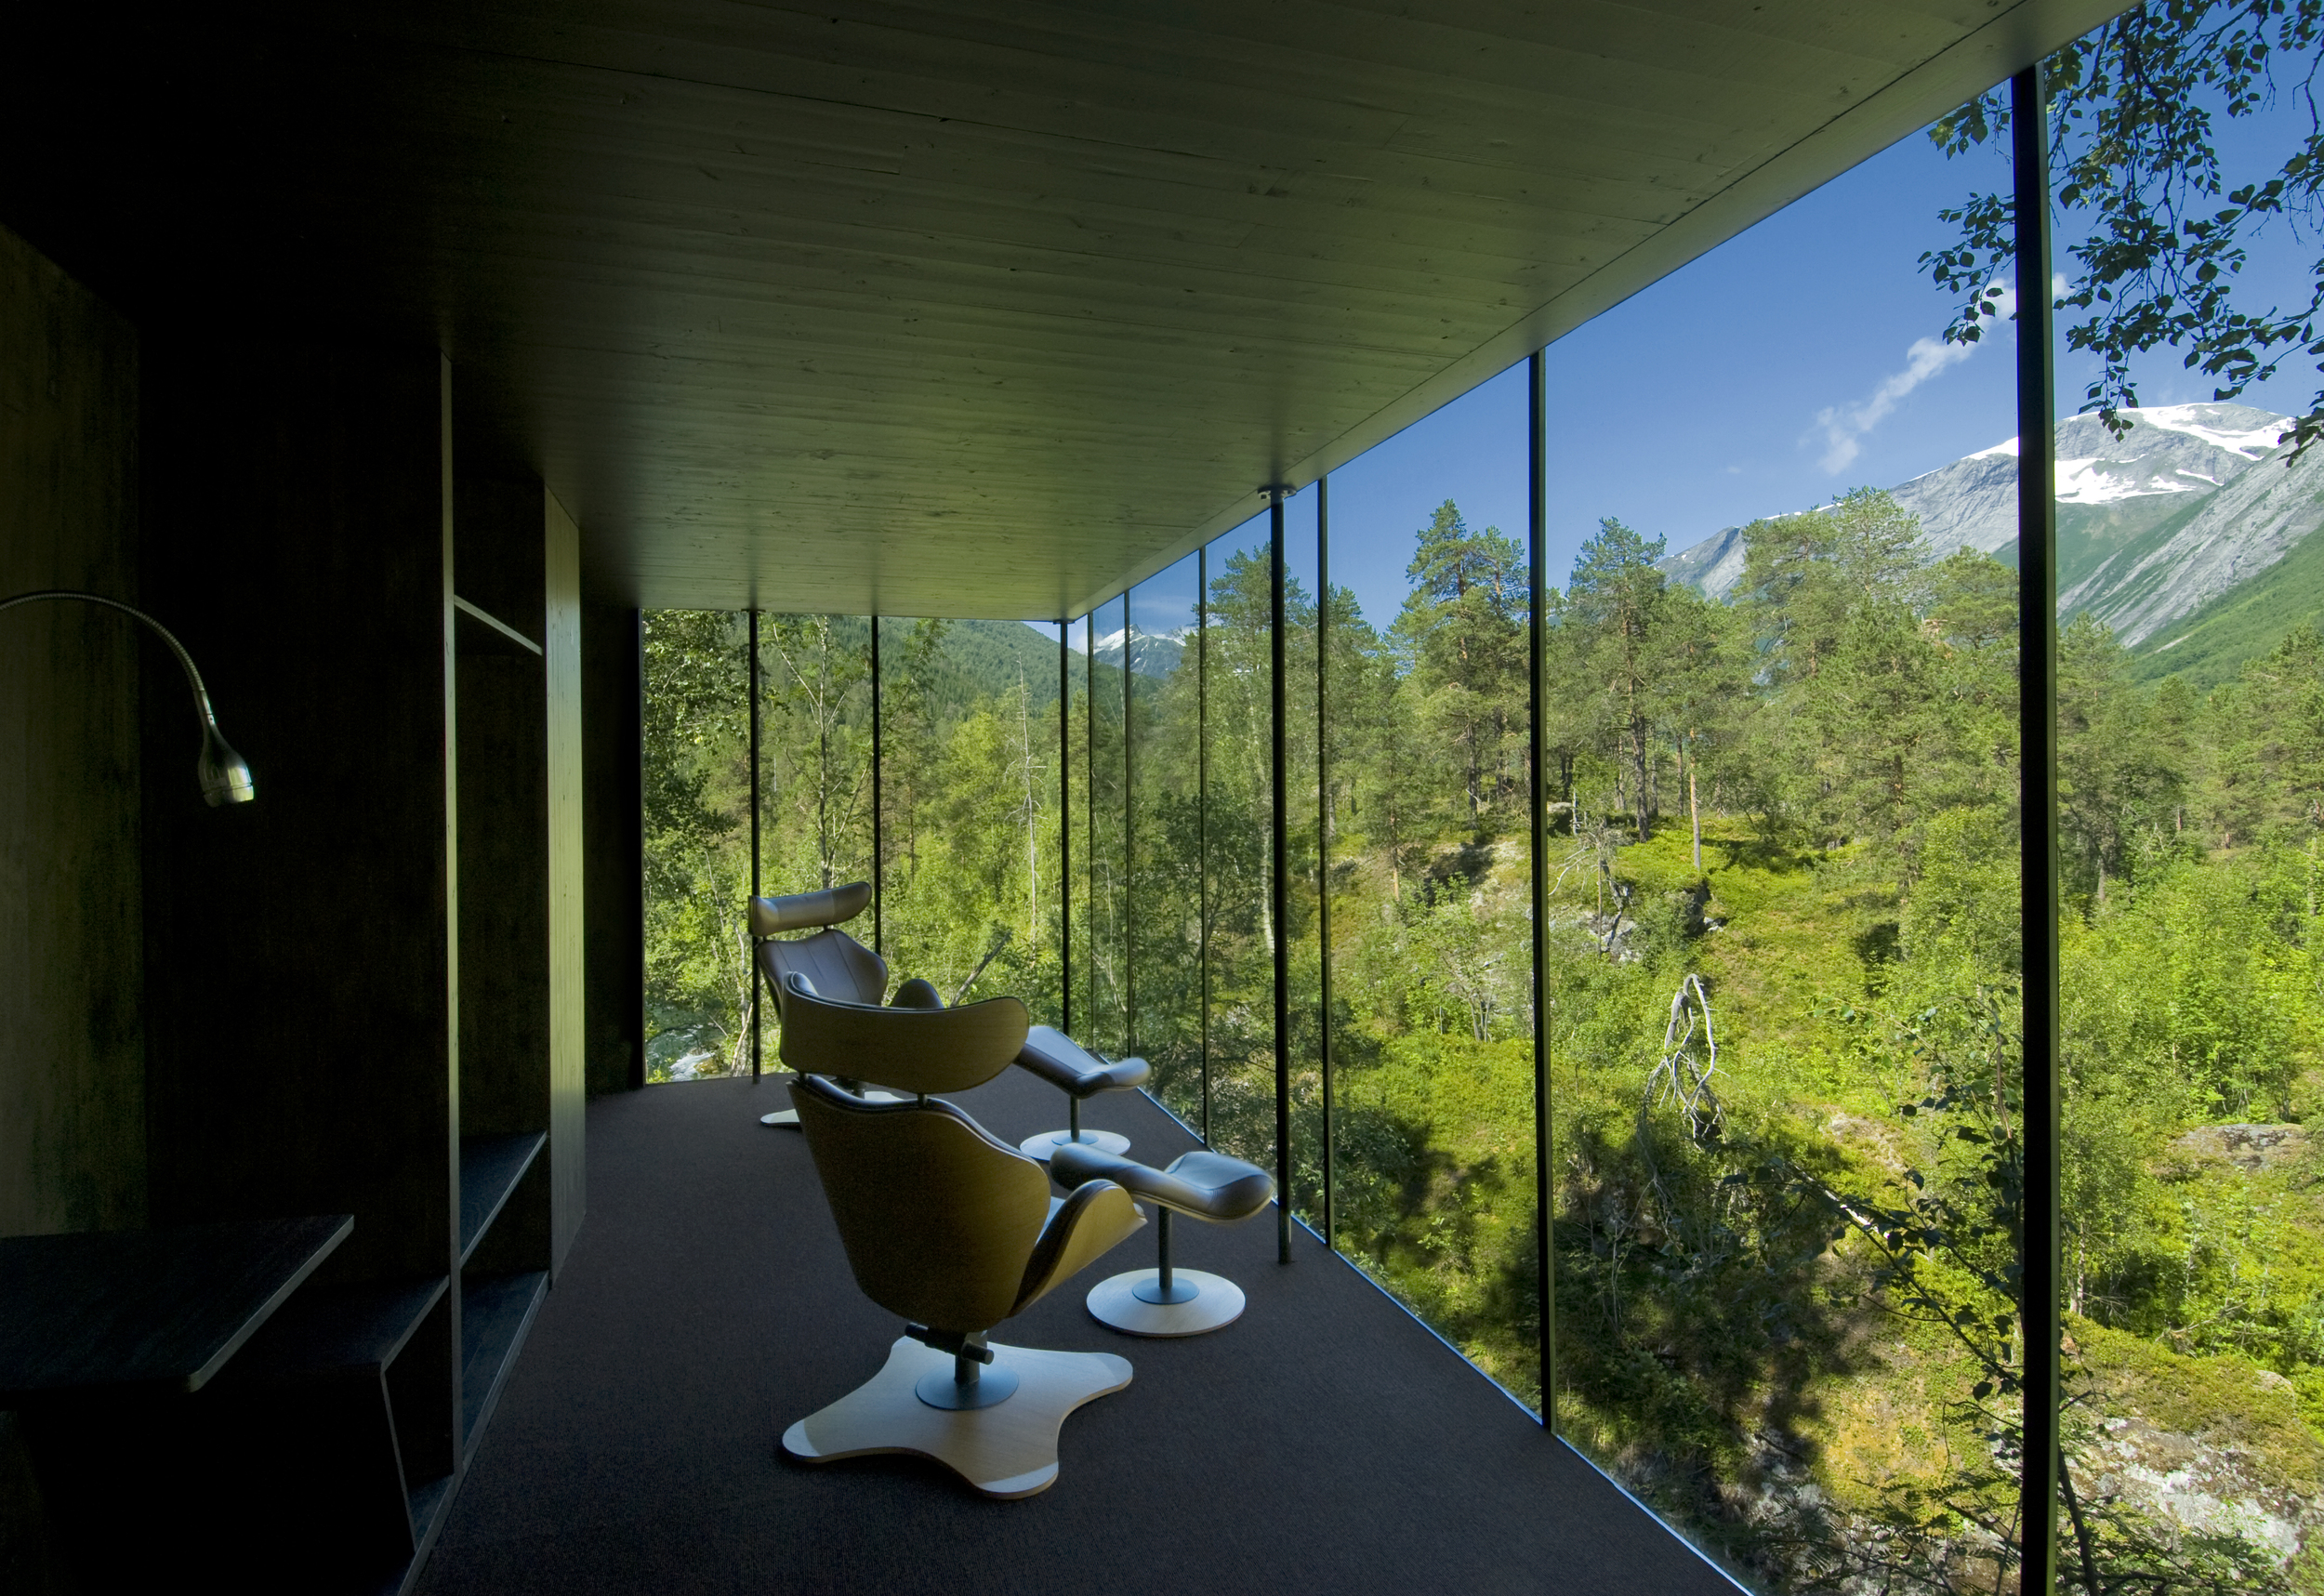 Photo by Juvet Landscape Hotel.